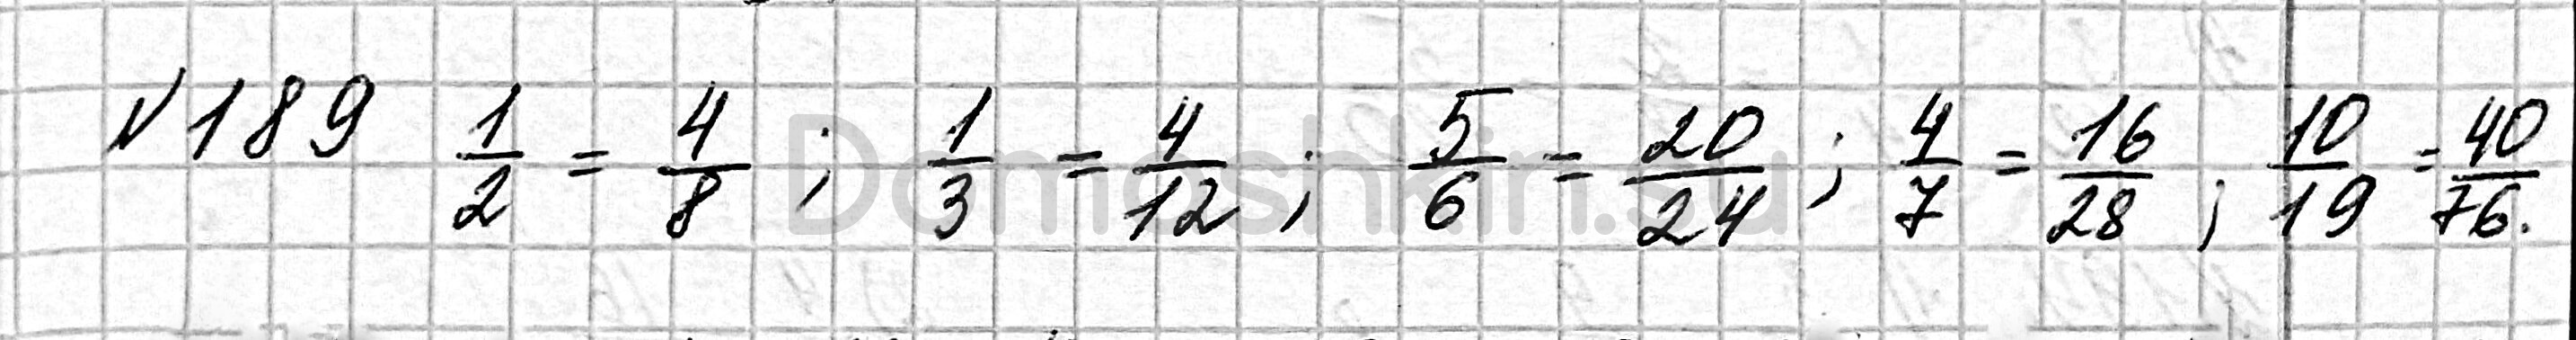 Математика 6 класс учебник Мерзляк номер 189 решение